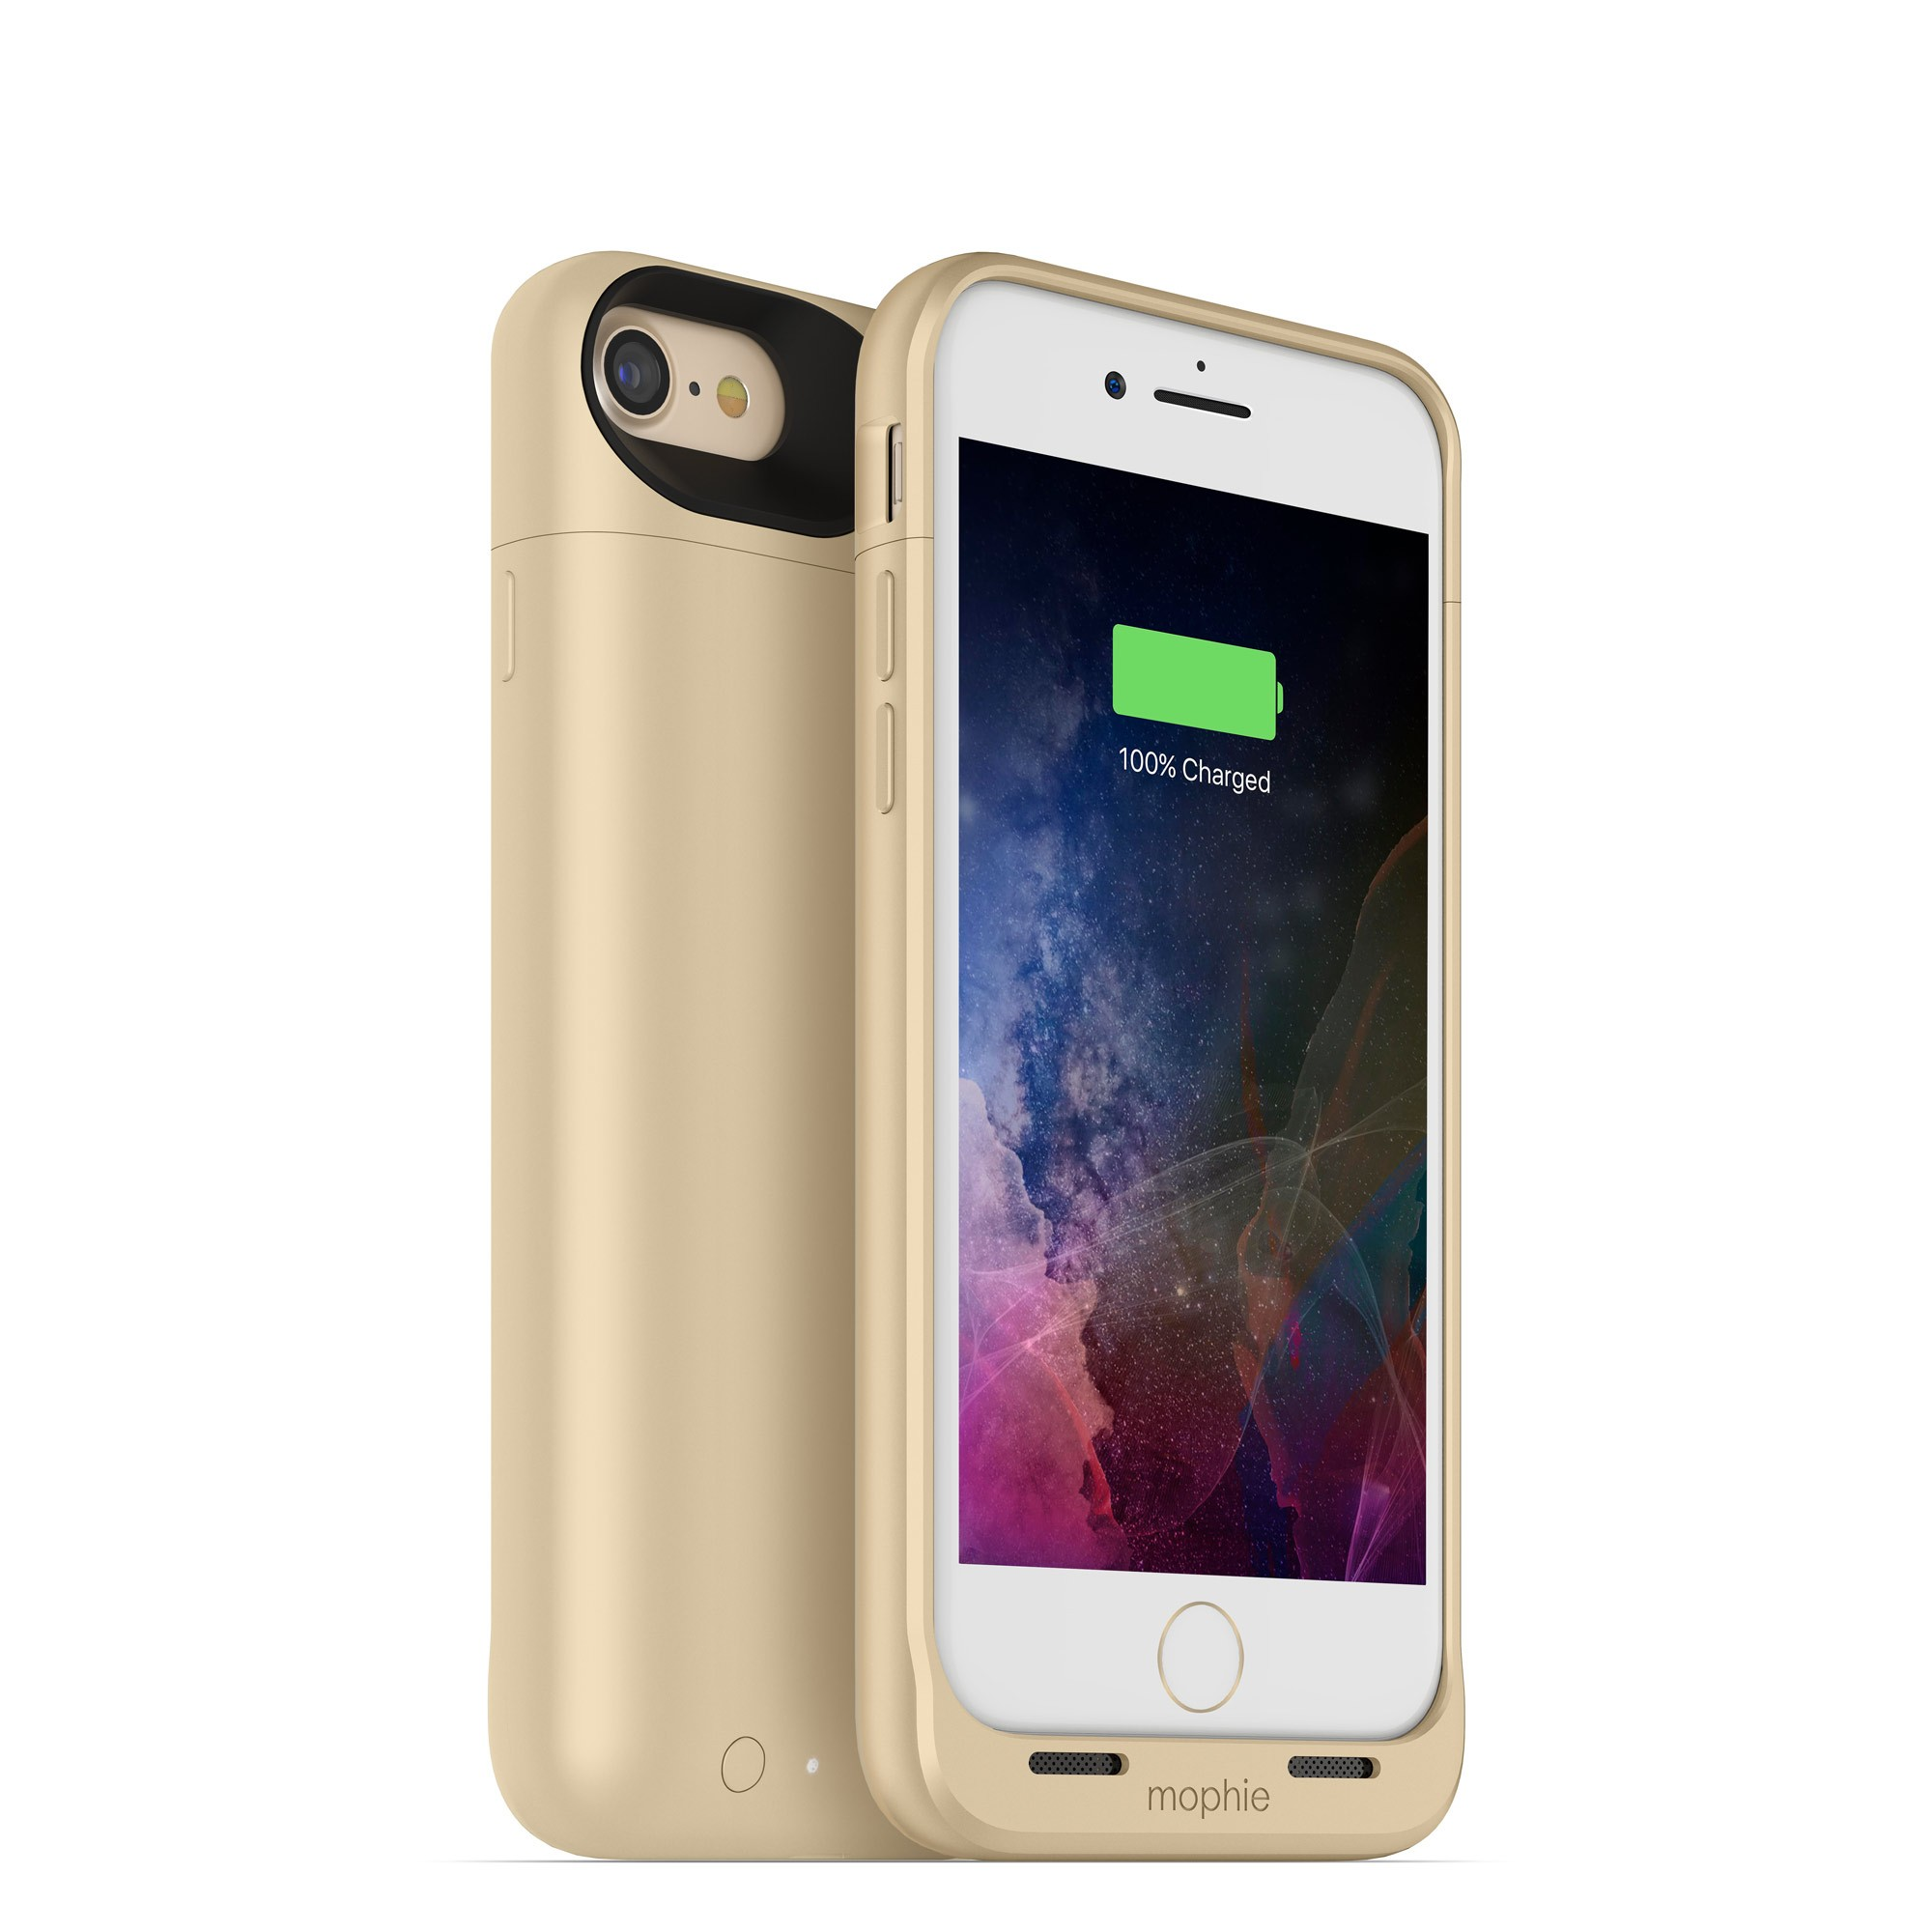 Nabíjecí pouzdro pro Apple iPhone 7 / 8 - Mophie, Juice Pack Air 2525mAh Gold